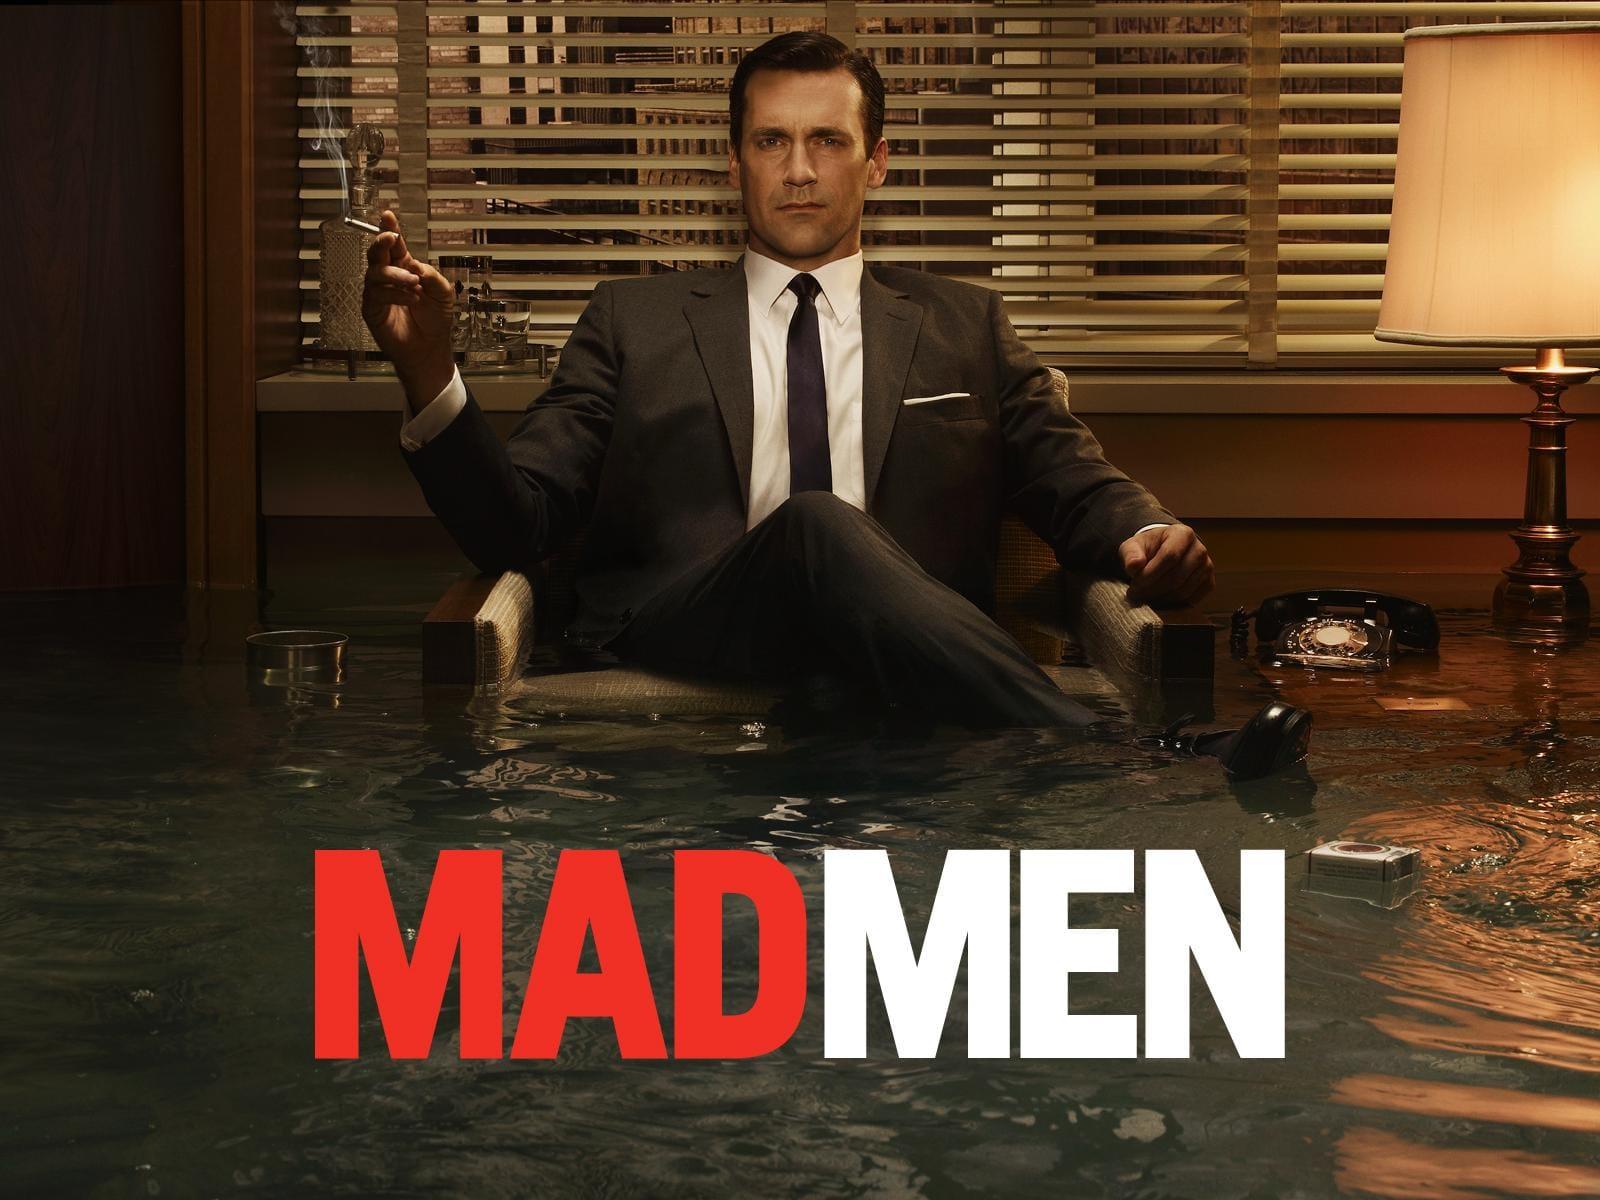 [Image: mad-men-tv-programs-photo-u3?fm=pjpg&q=80]